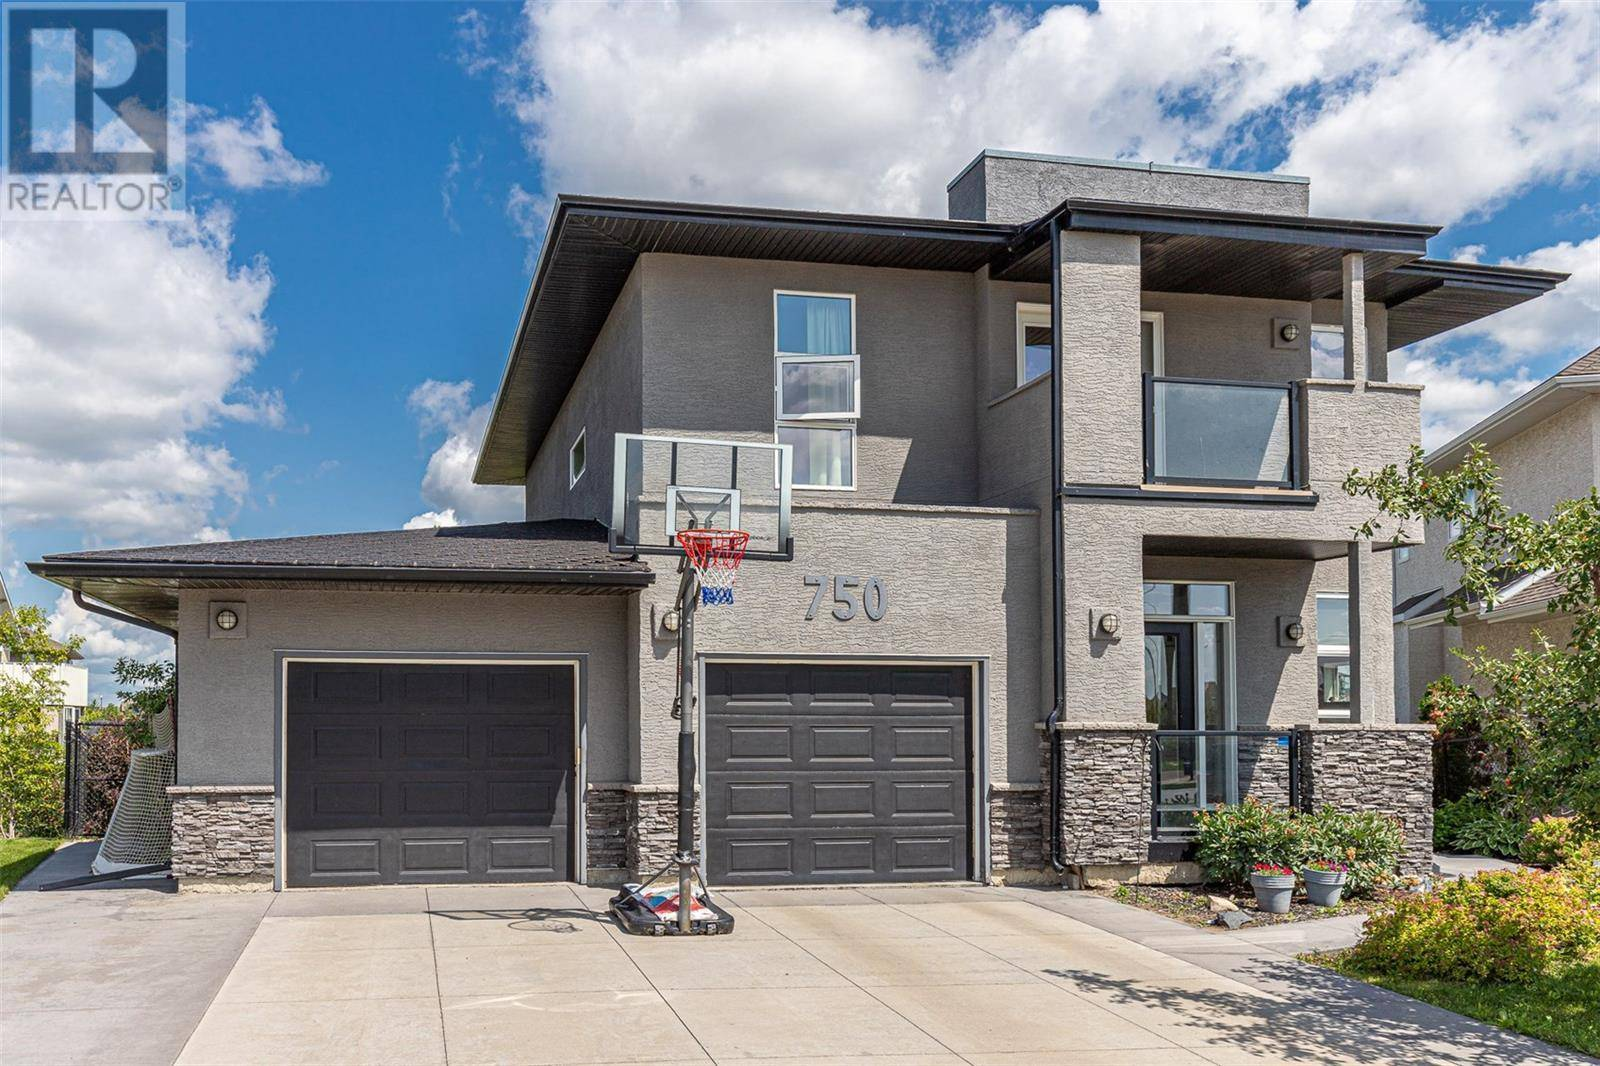 House for sale at 750 Greaves Cres Saskatoon Saskatchewan - MLS: SK788284